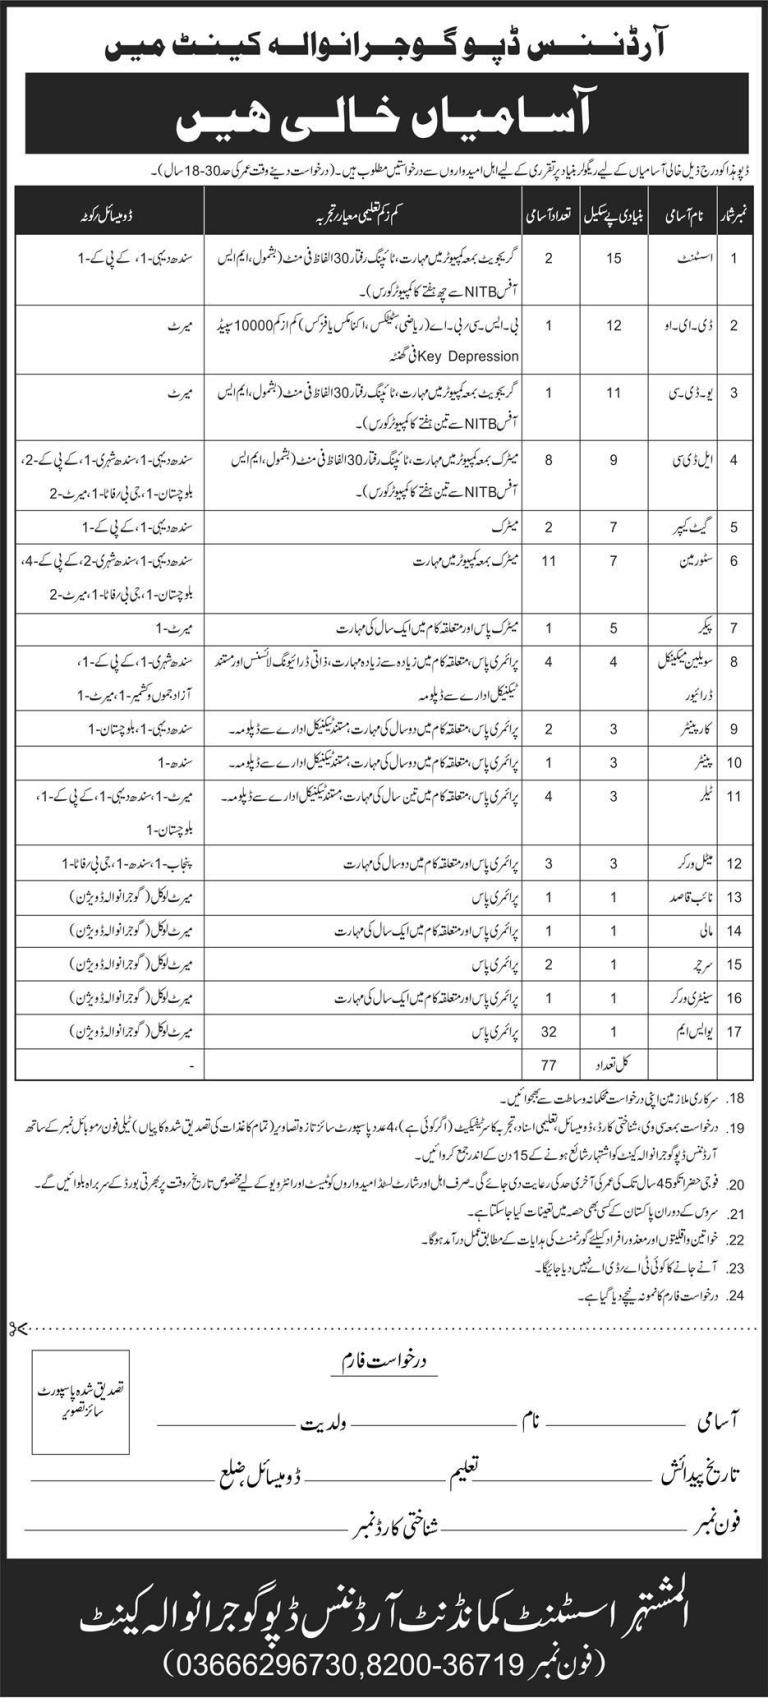 Ordnance Depu Jobs in Pak Army Latest